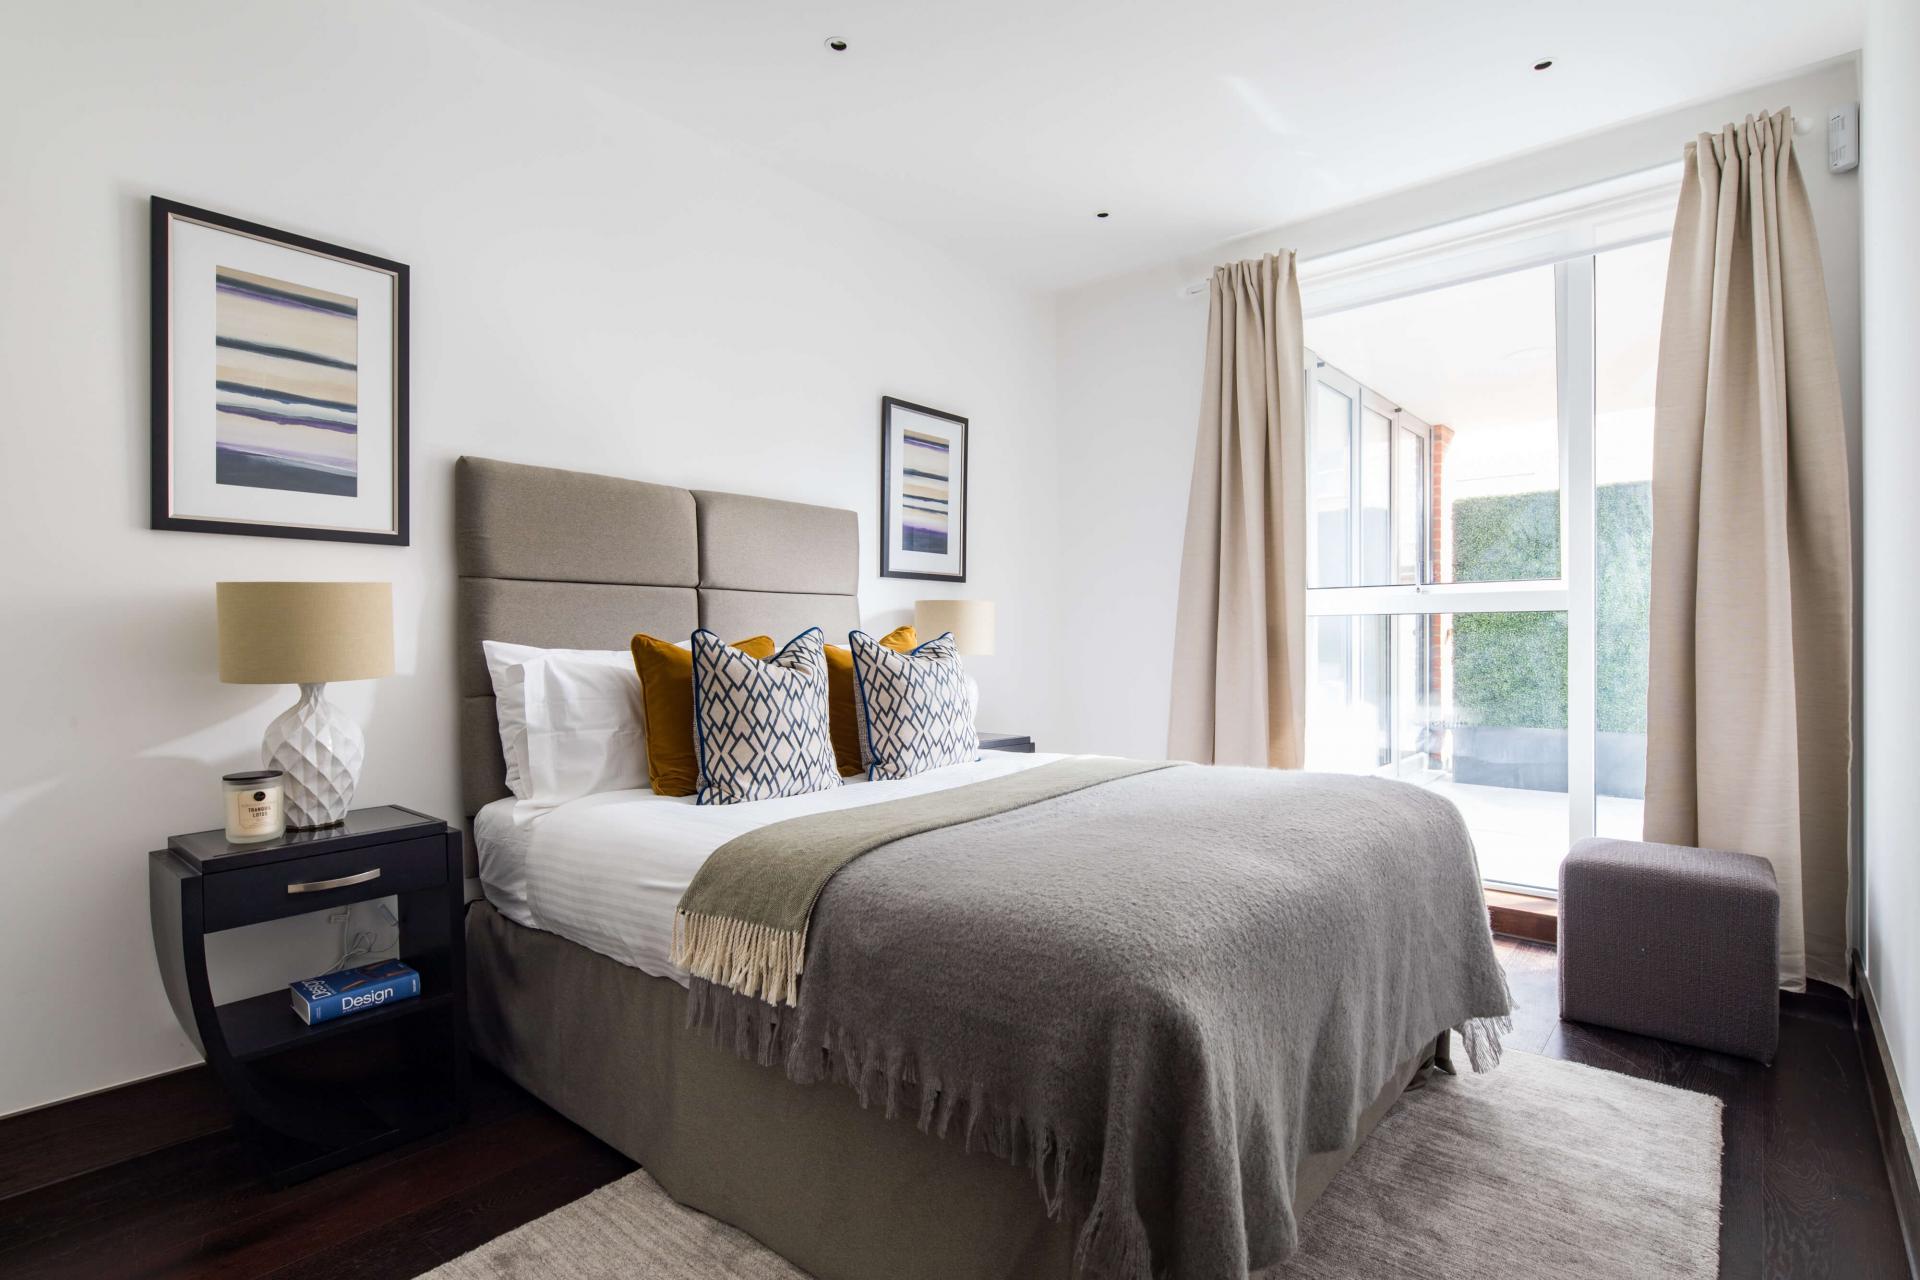 Comfy bed at Logan Place Apartments, Kensington, London - Citybase Apartments